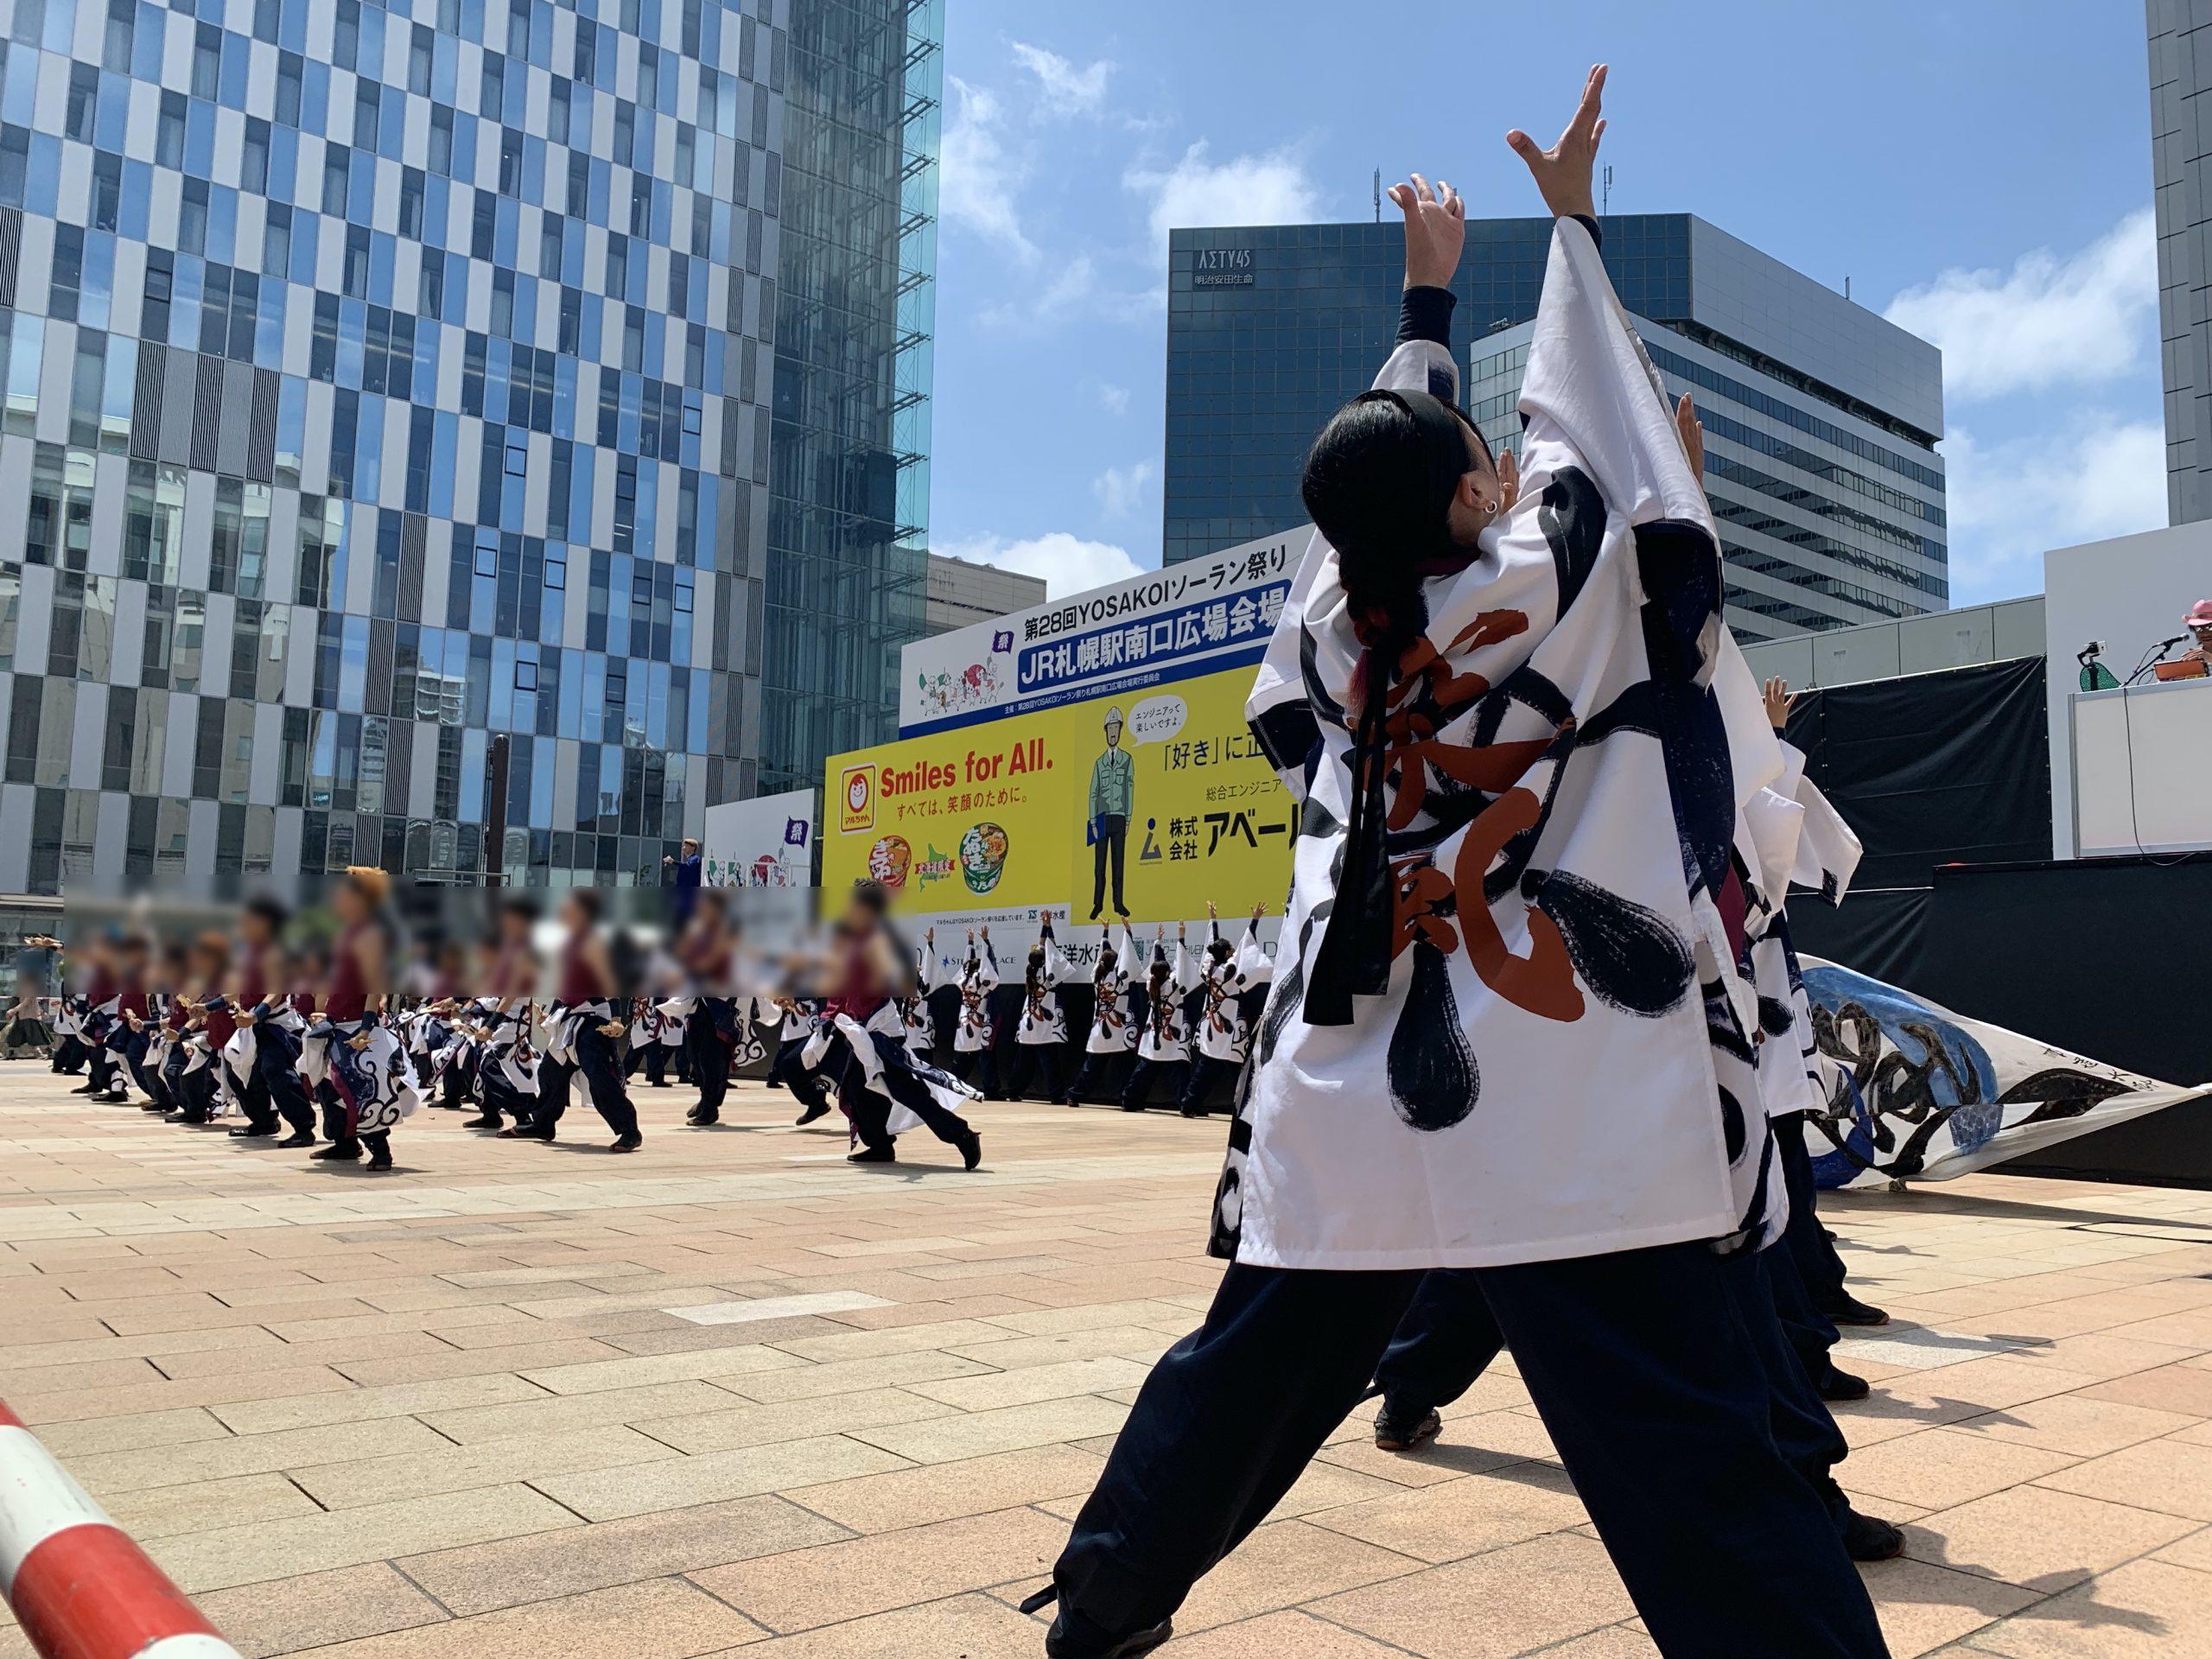 YOSAKOIソーラン祭 JR札幌駅南口広場会場